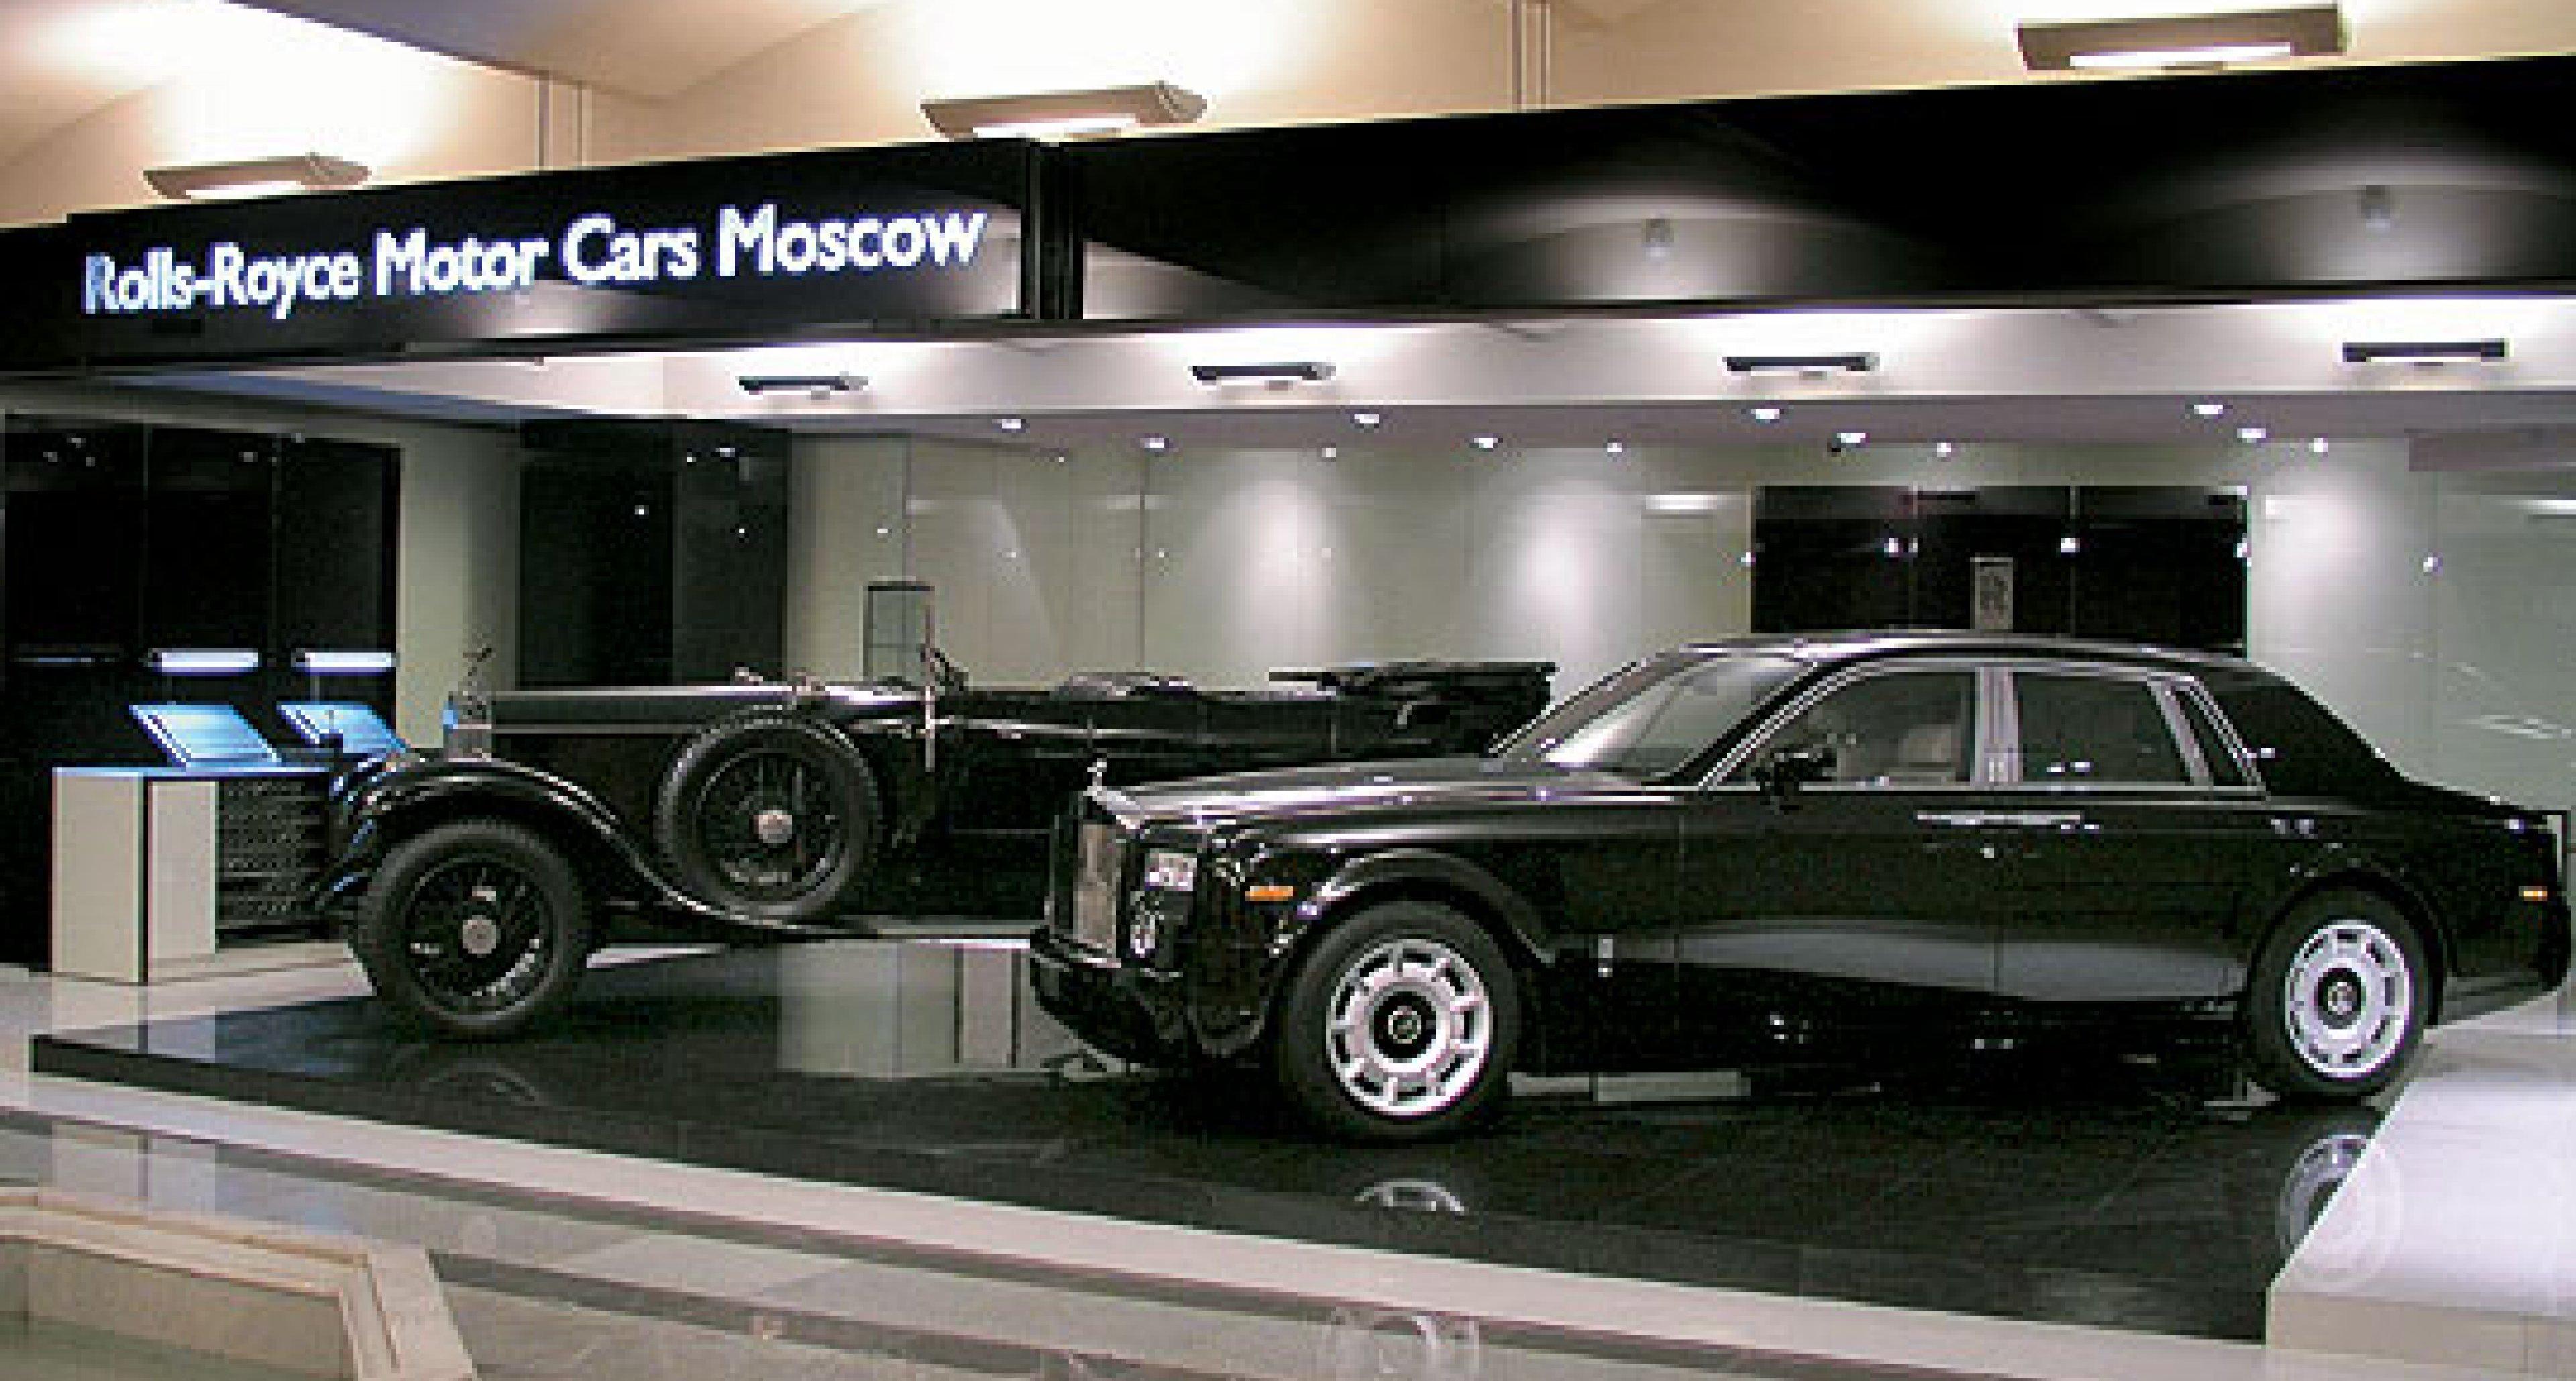 Rolls-Royce eröffnet neuen Showroom am Roten Platz, Moskau